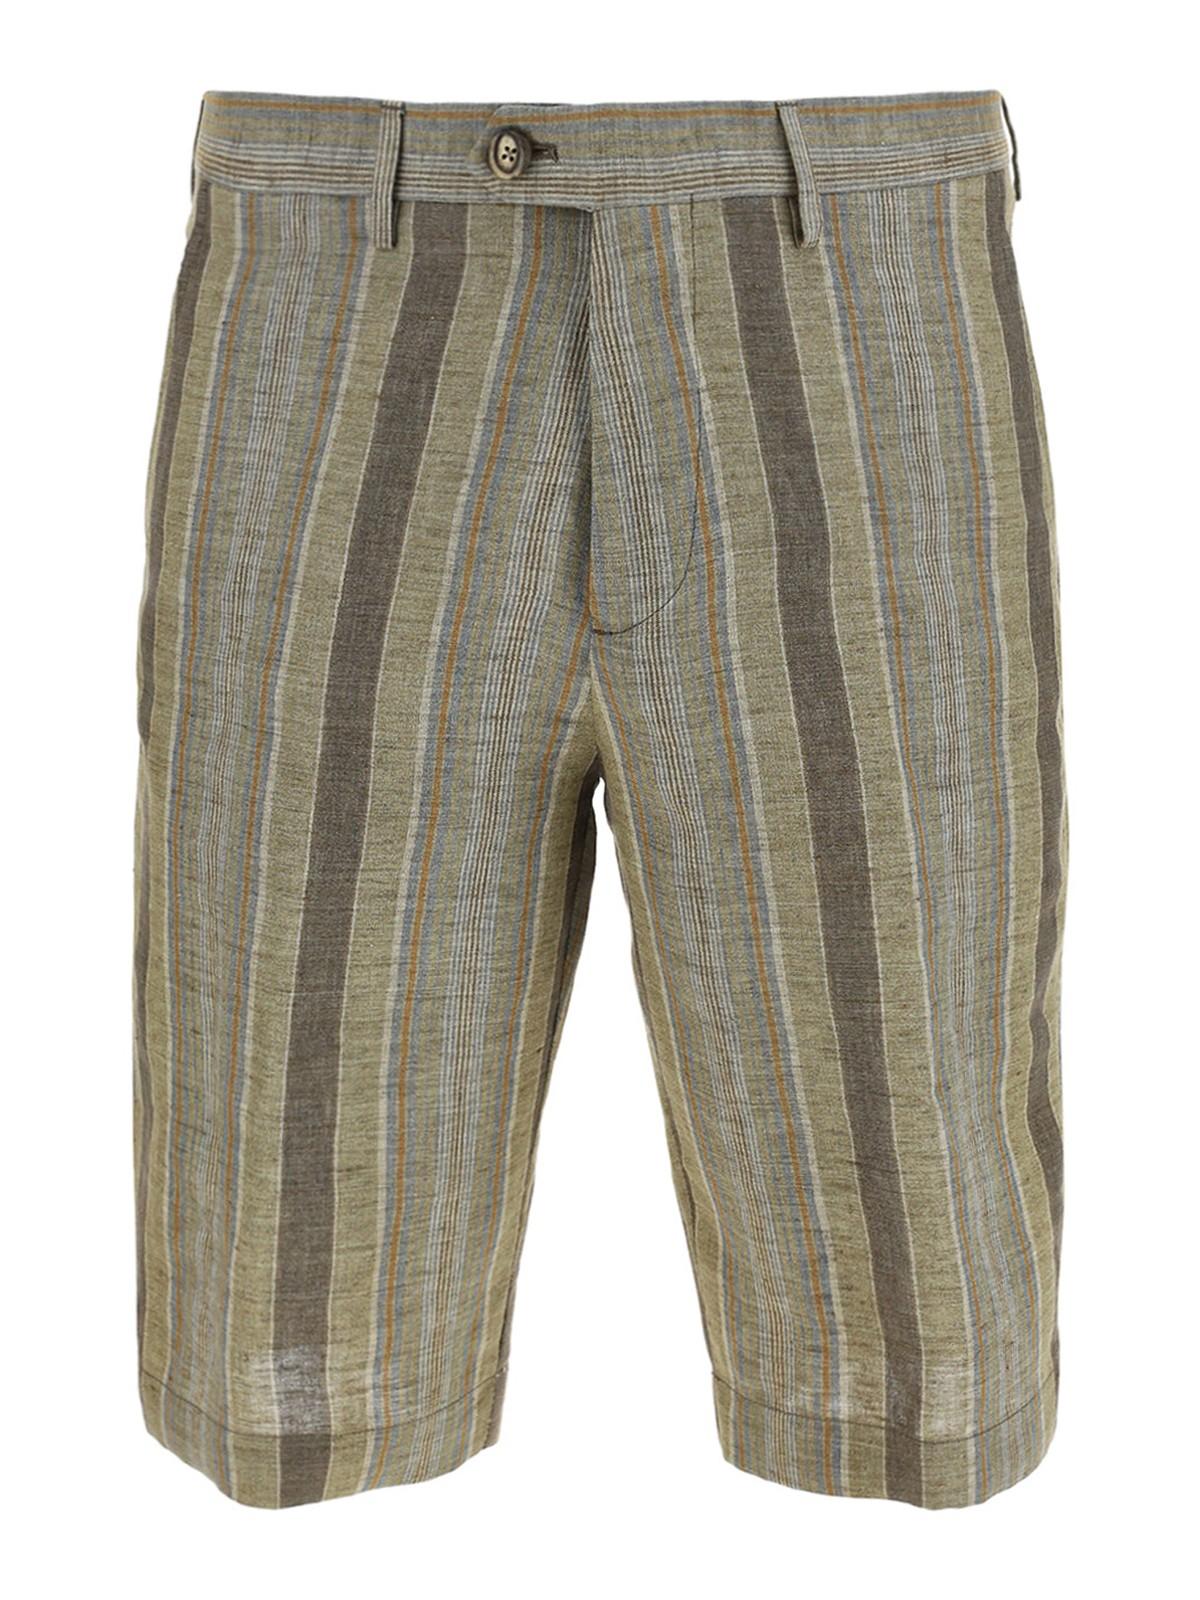 Etro Cottons STRIPED COTTON BERMUDA SHORTS